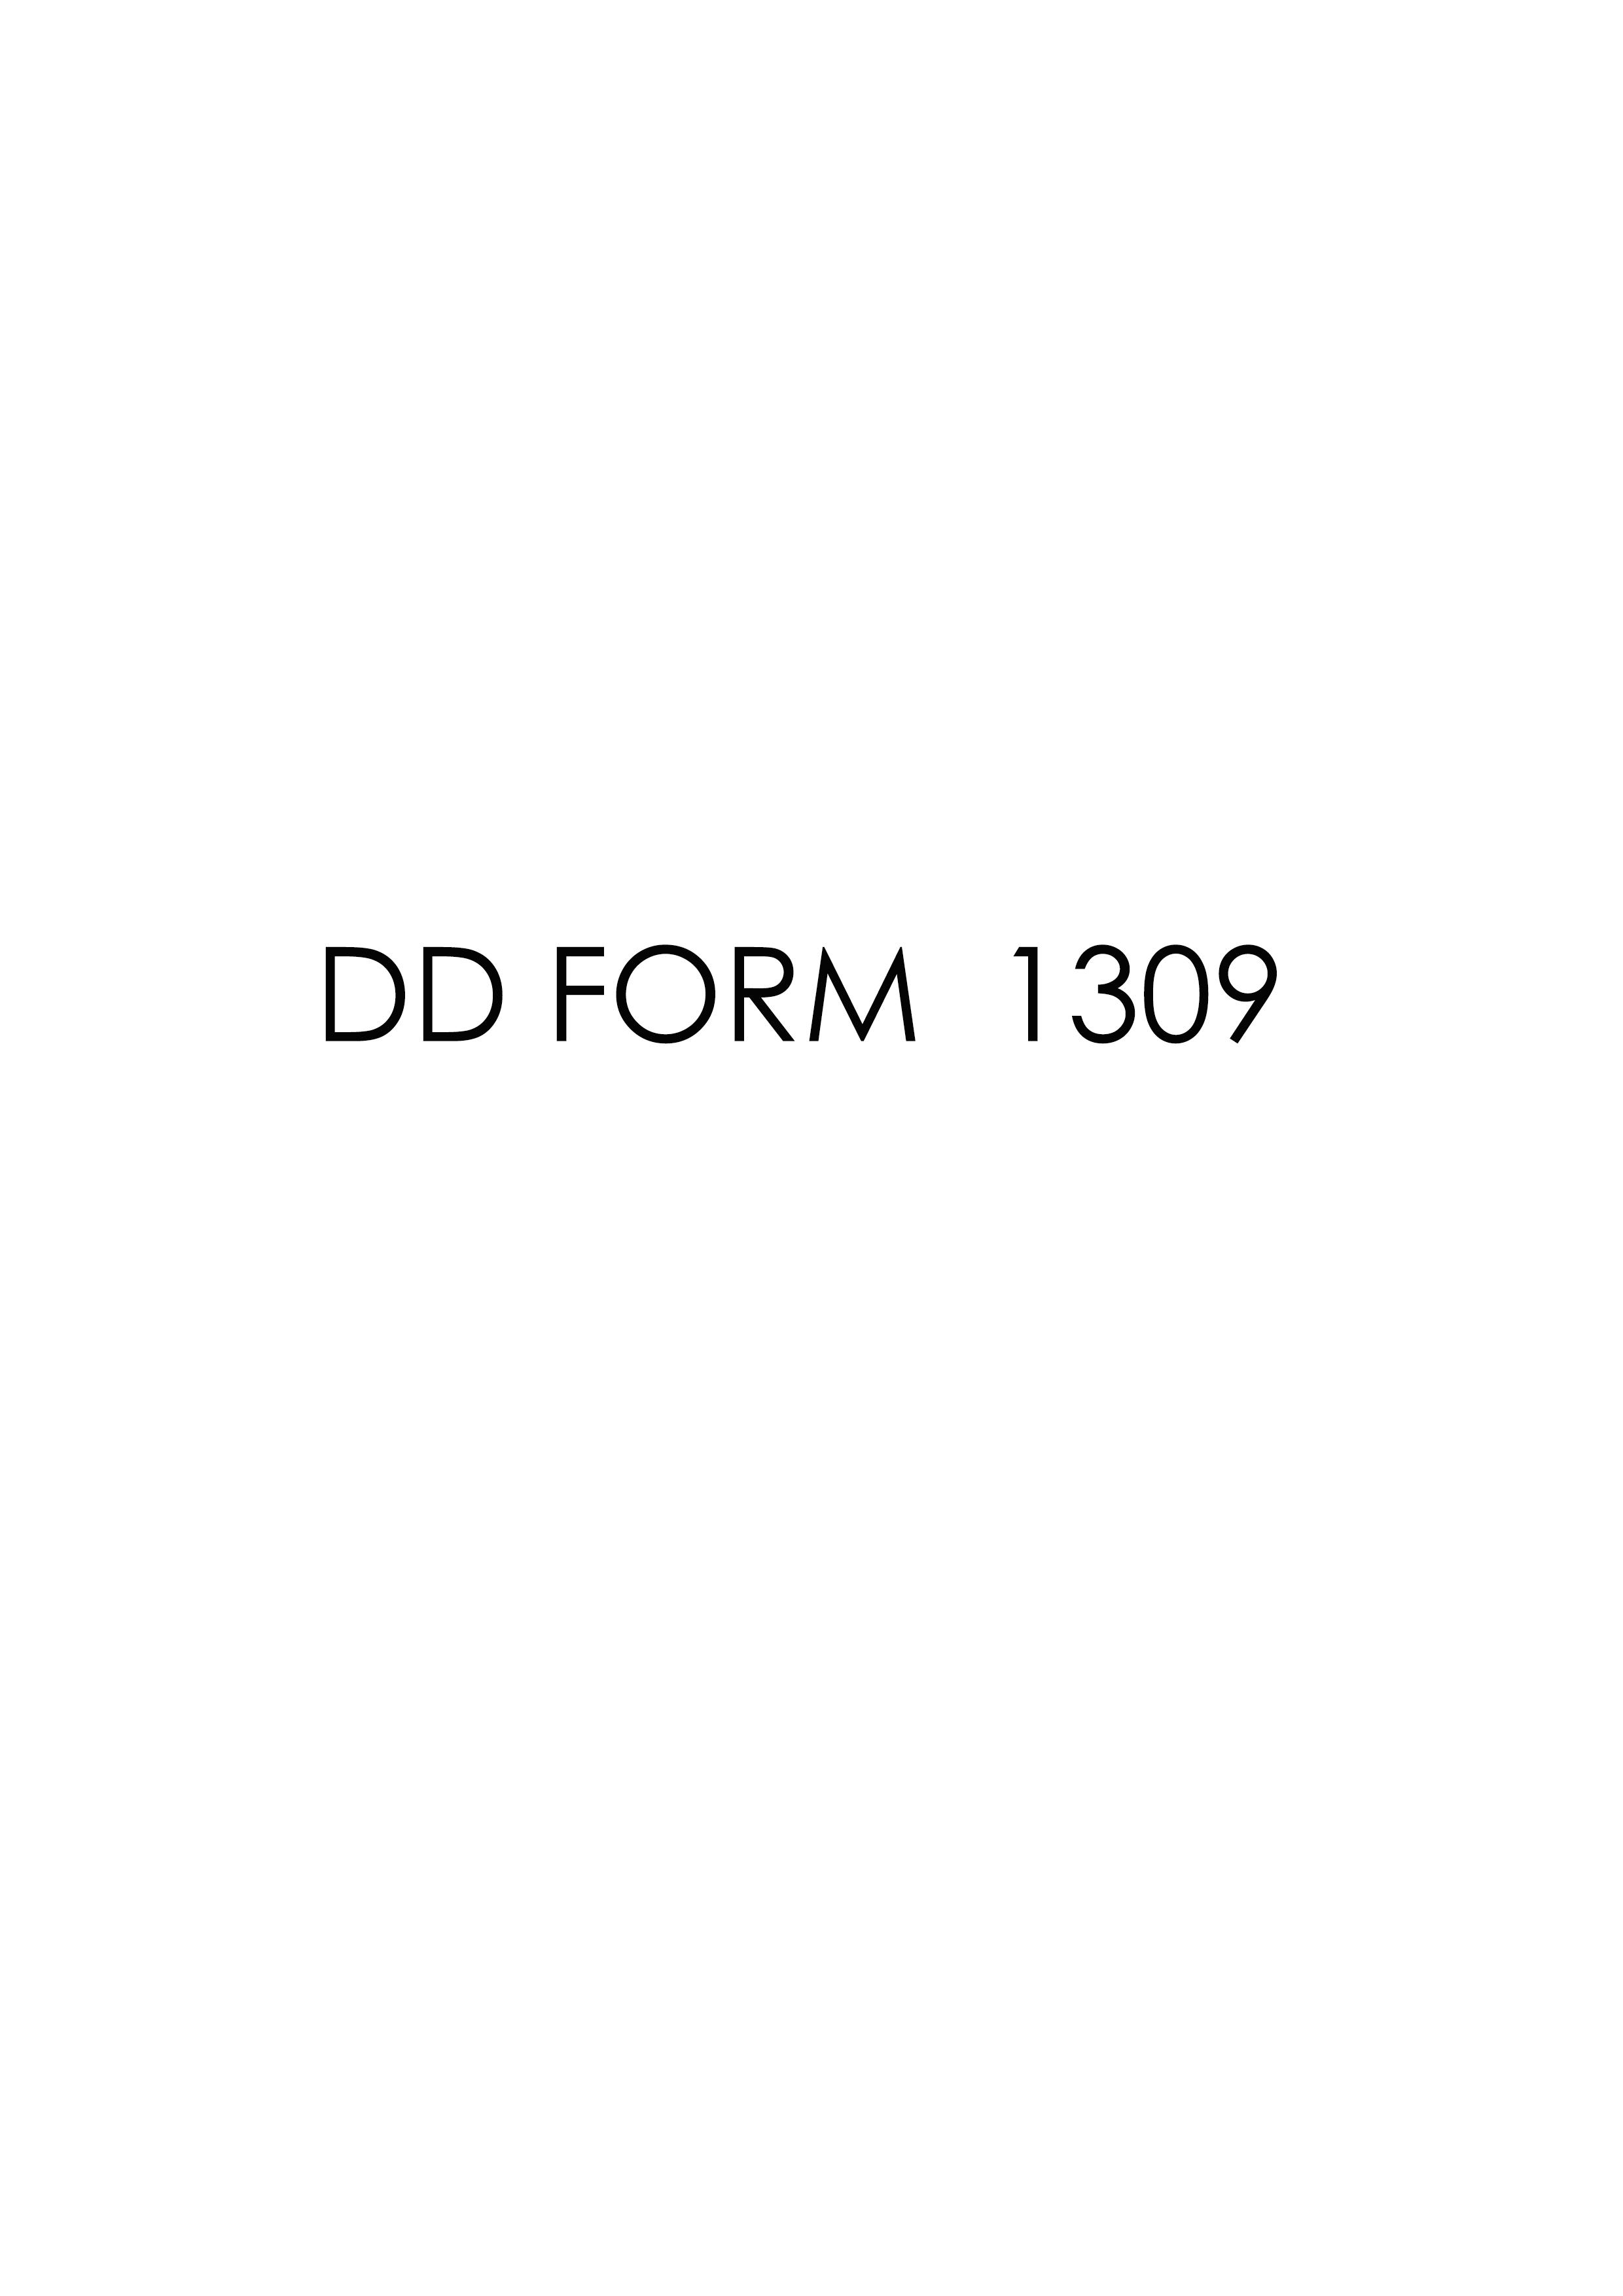 Download dd Form 1309 Free